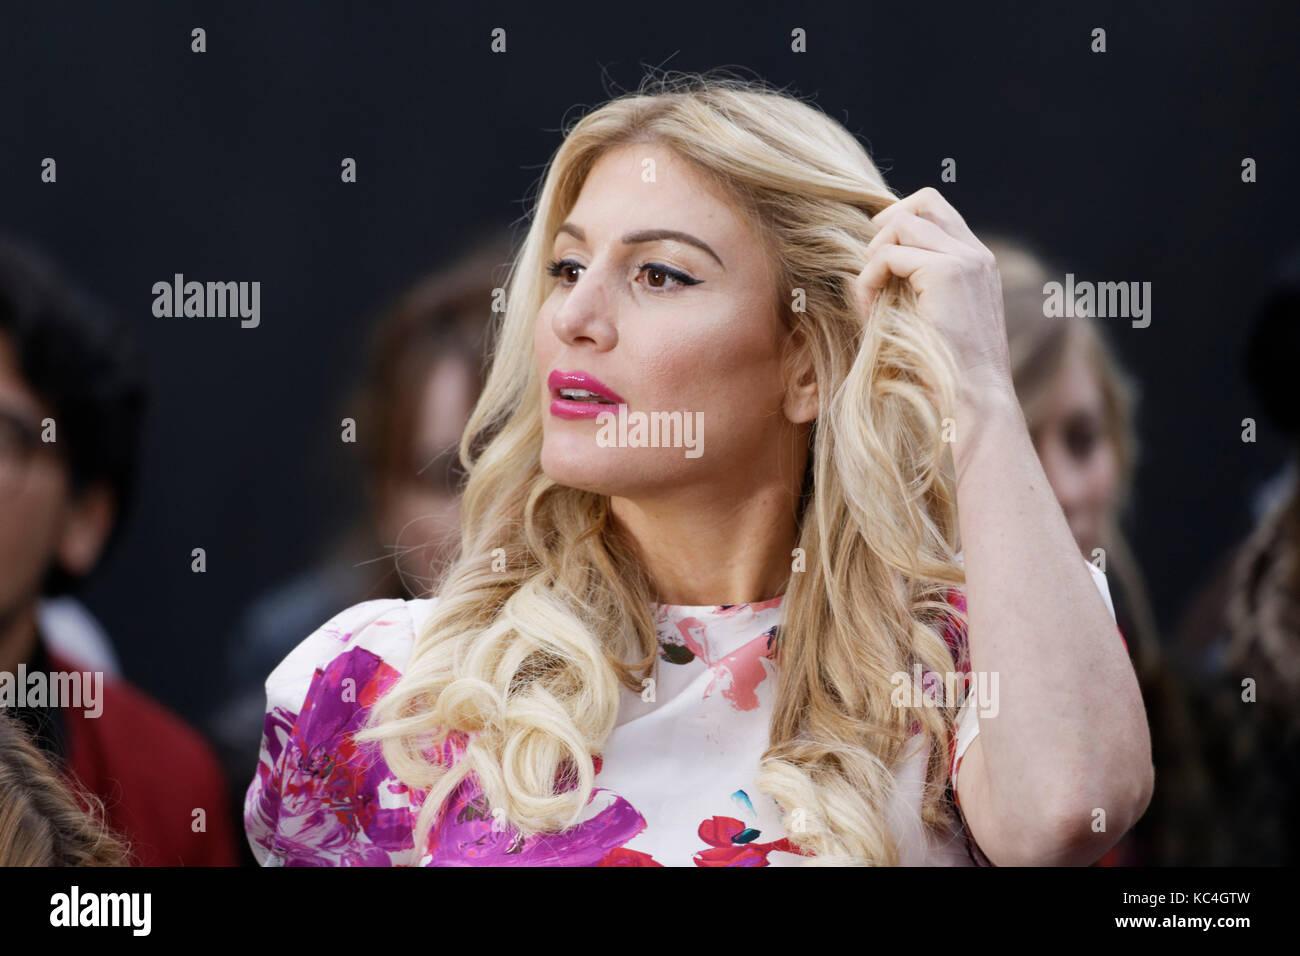 París, Francia. 1 de octubre de 2017. Hofit Golan asiste a la feria L'Oréal Paris como parte de la Semana de la Foto de stock